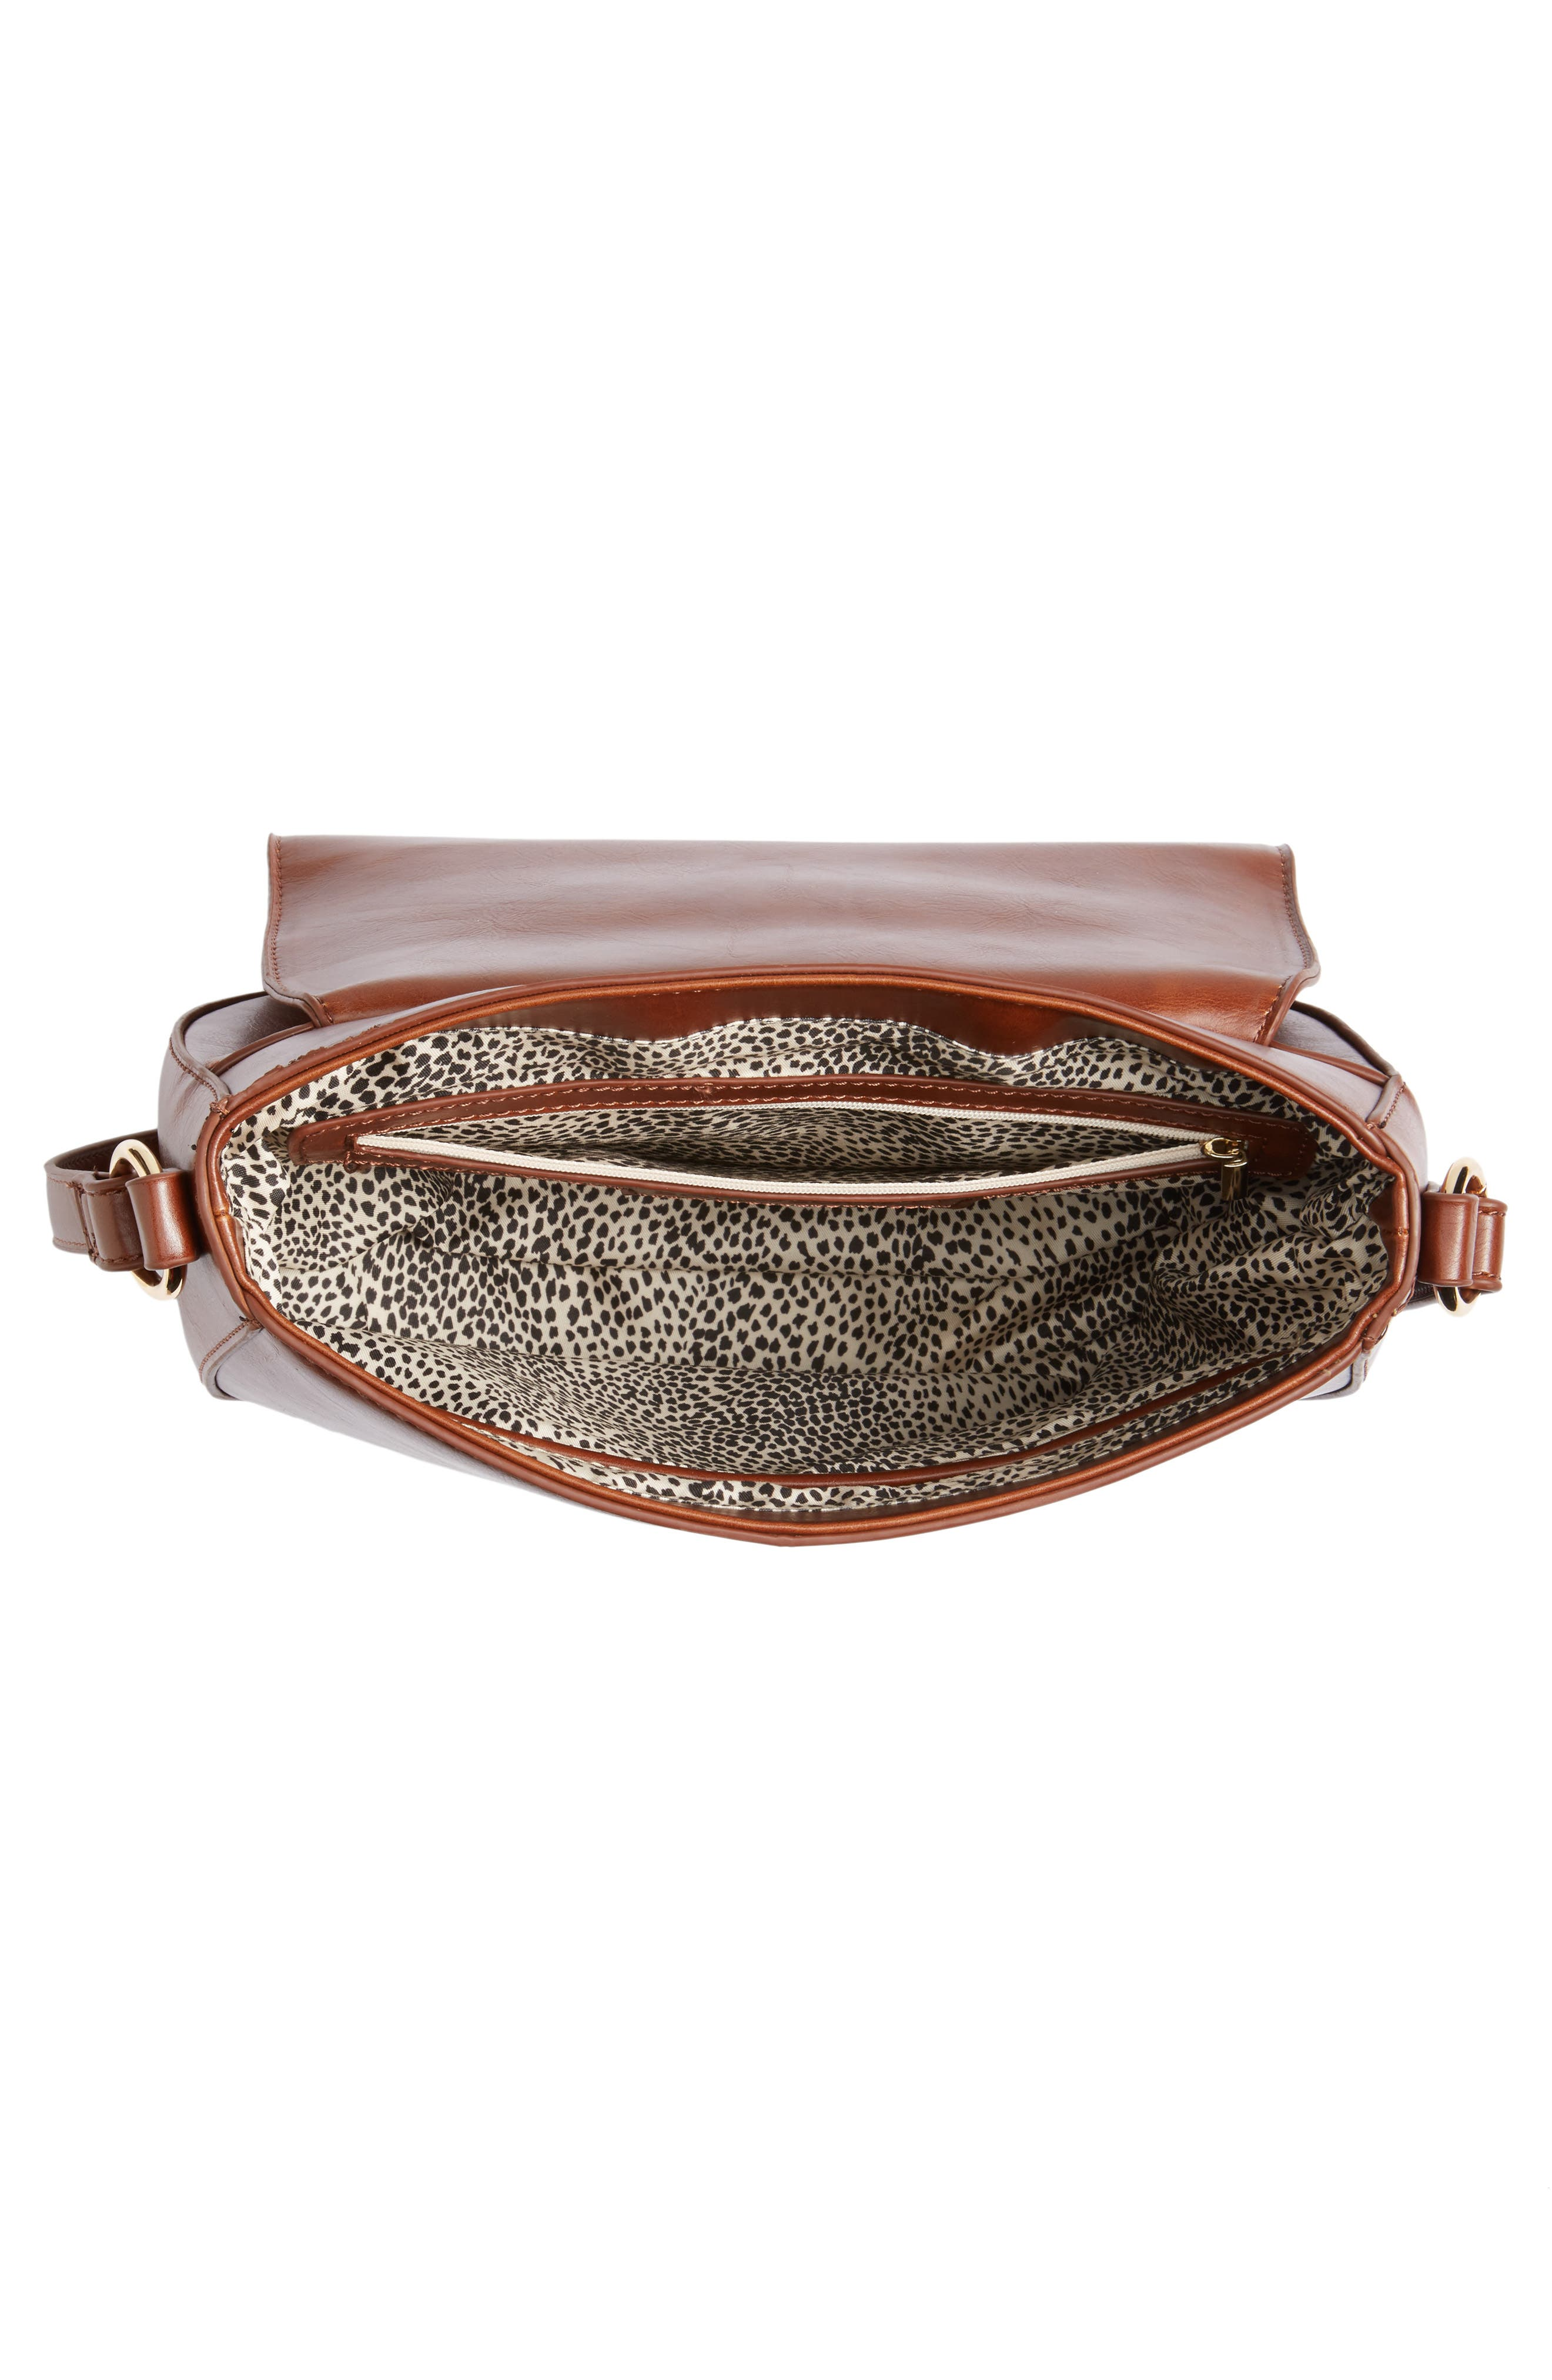 Piri Faux Leather Saddle Bag,                             Alternate thumbnail 12, color,